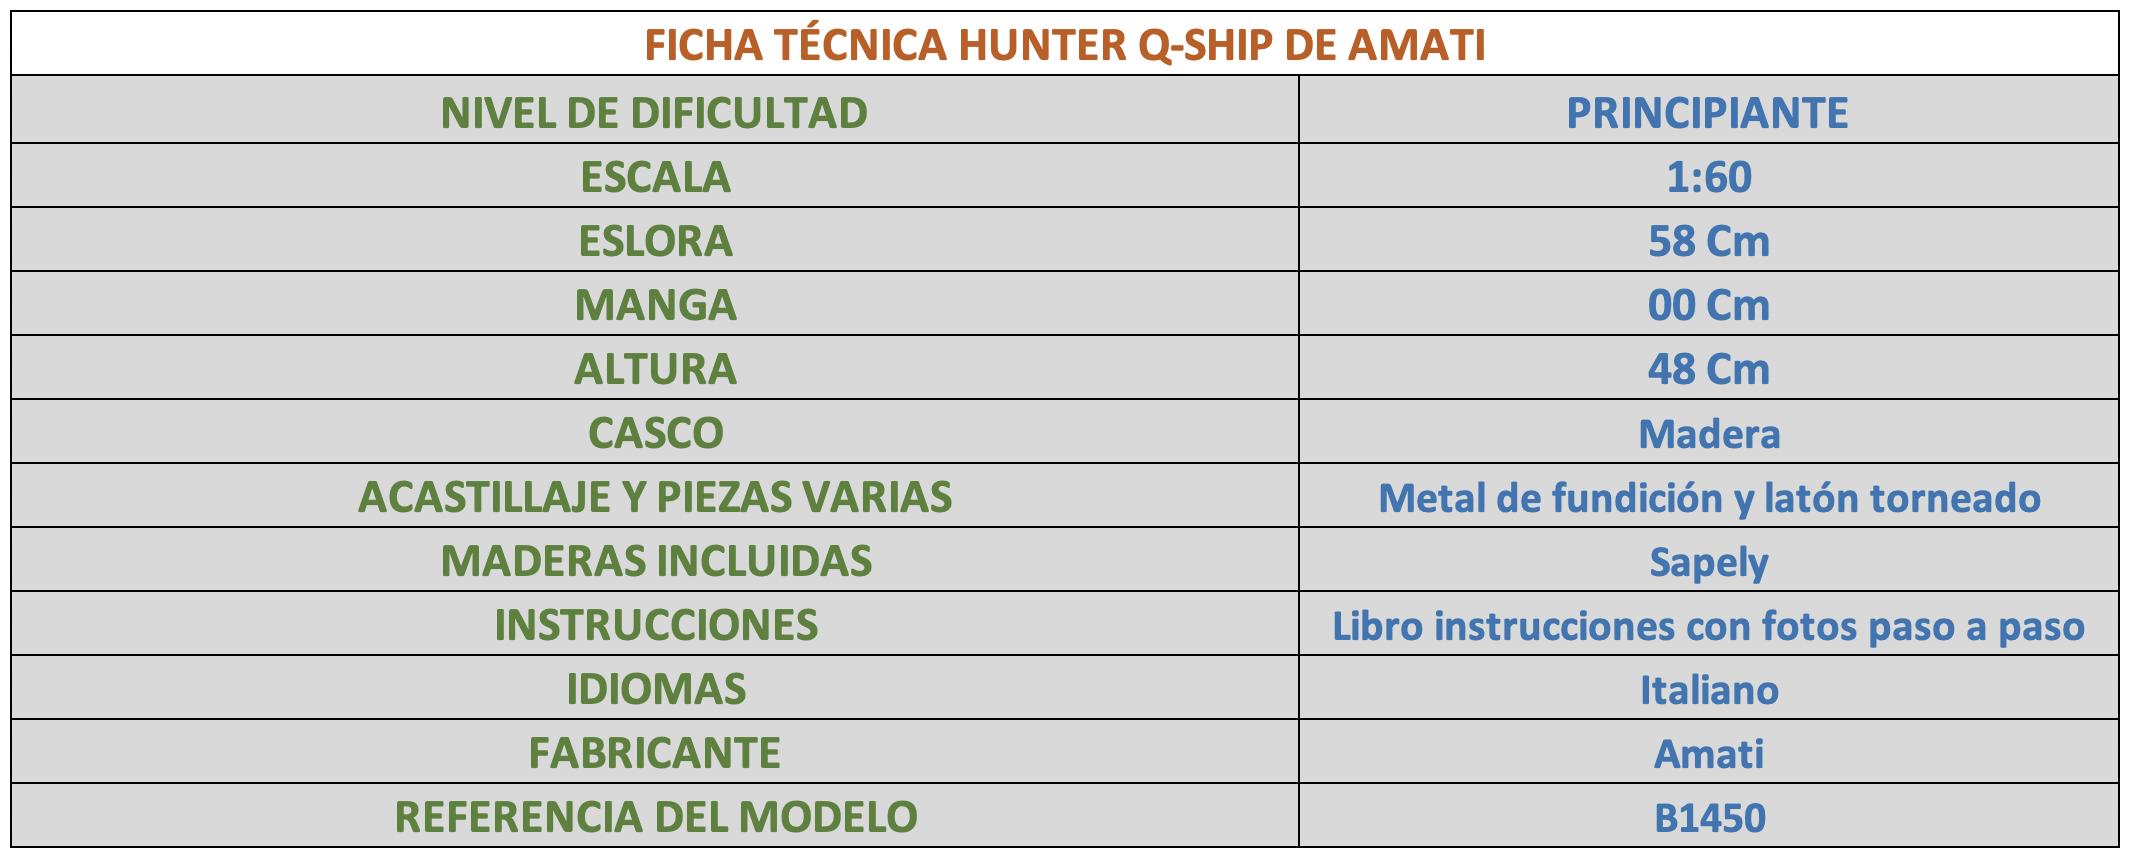 FICHA TECNICA HUNTER